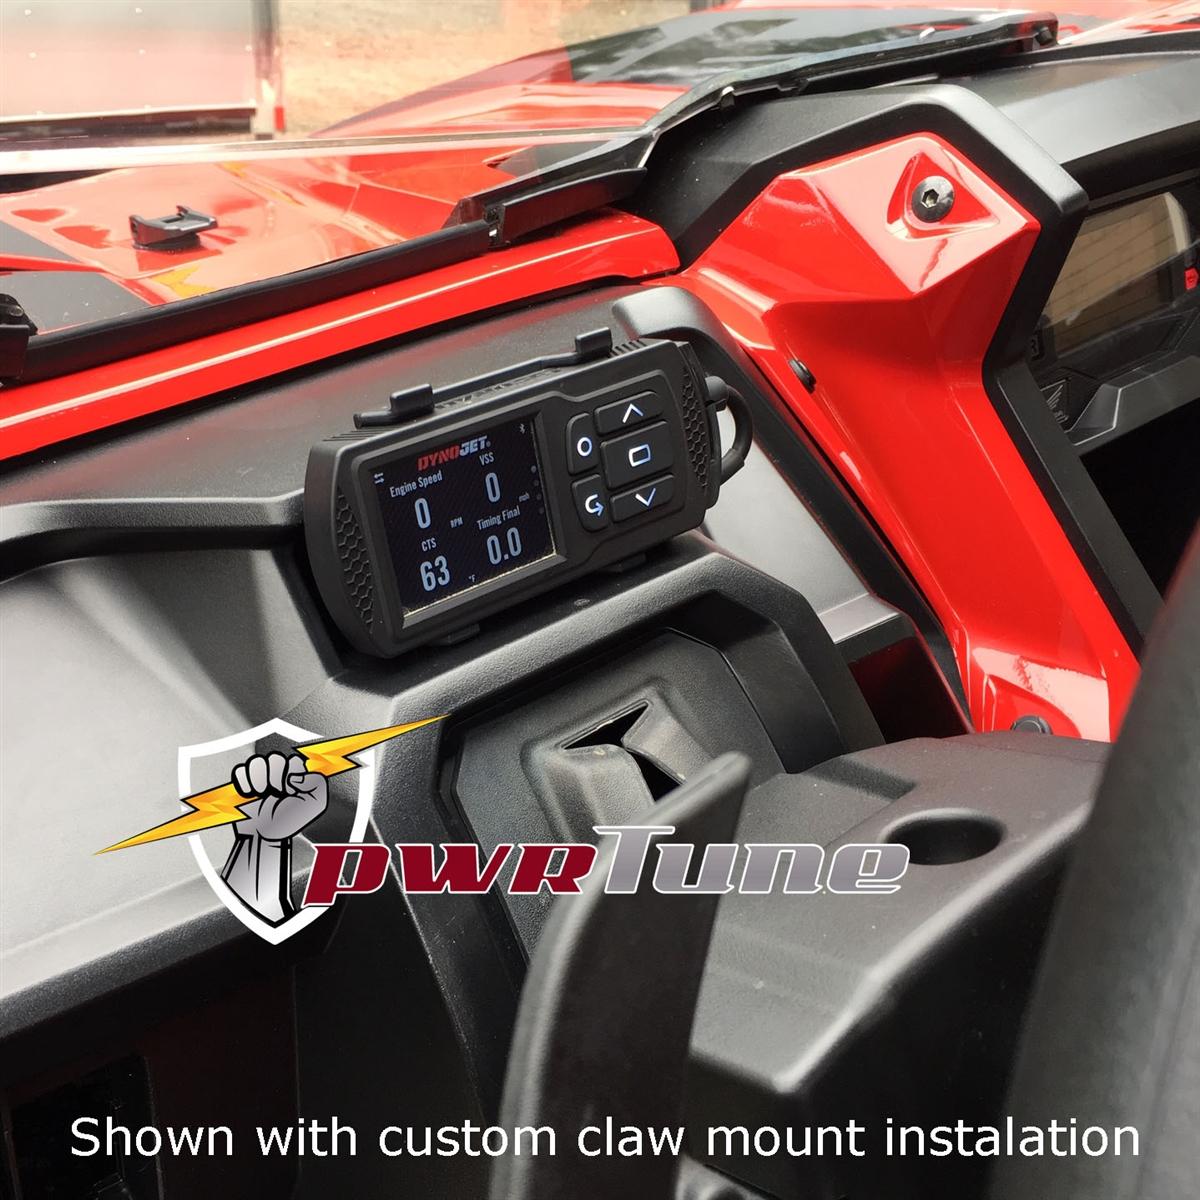 Power Vision pwrTune ECU Performance tune for Honda Talon